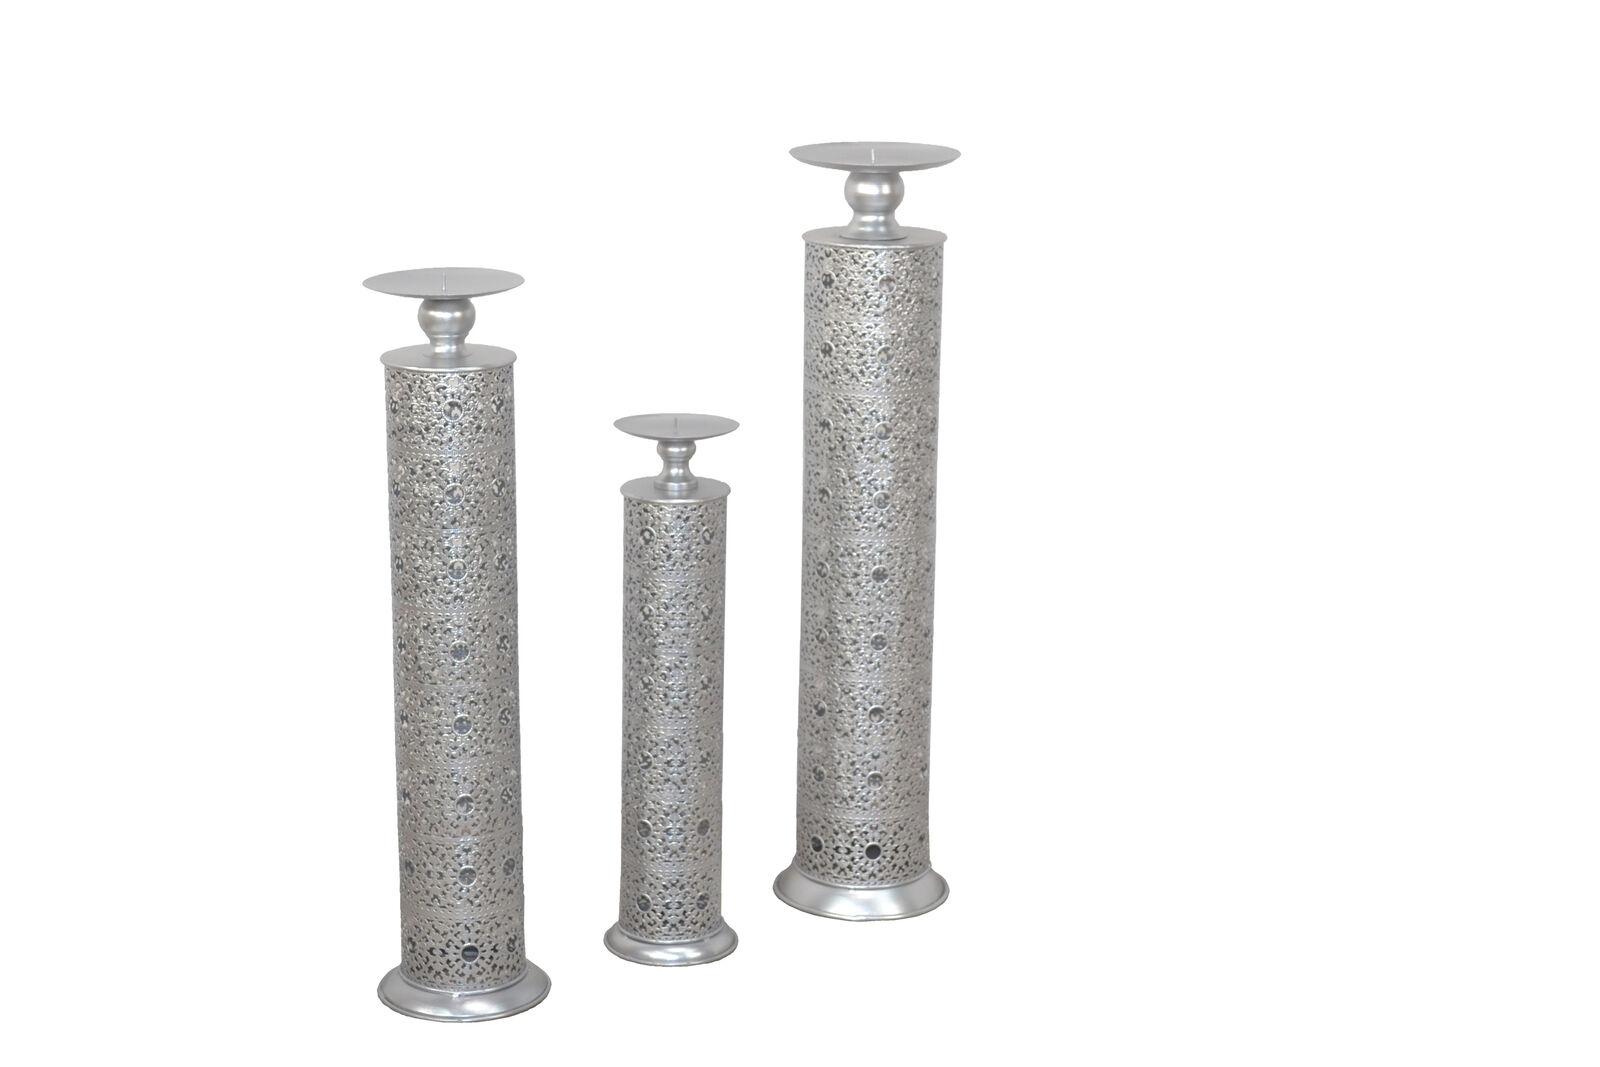 Moebel direkt online 3tlg. Kerzenständer-Set silber